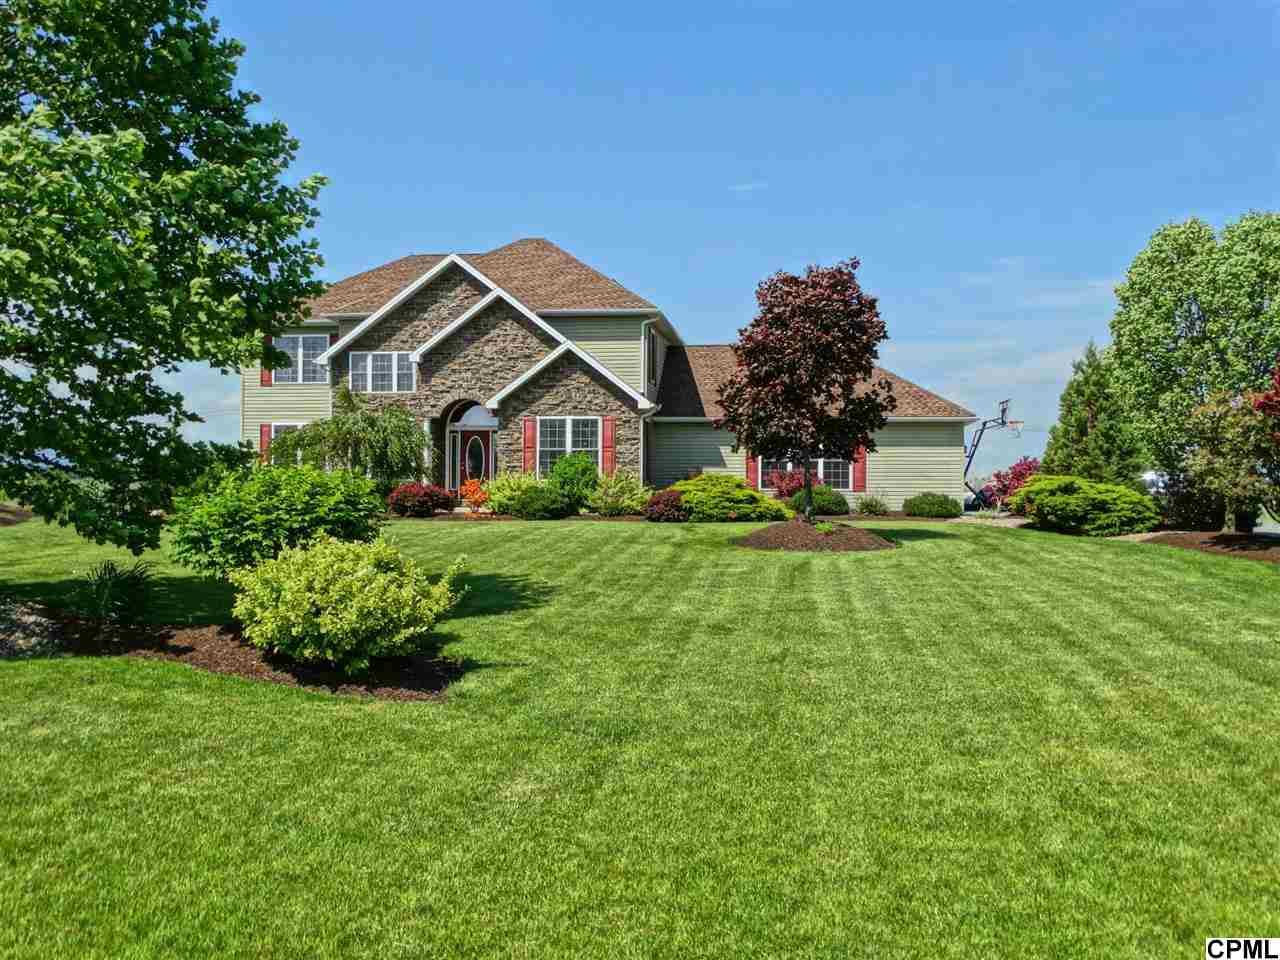 Real Estate for Sale, ListingId: 28543487, Shippensburg,PA17257